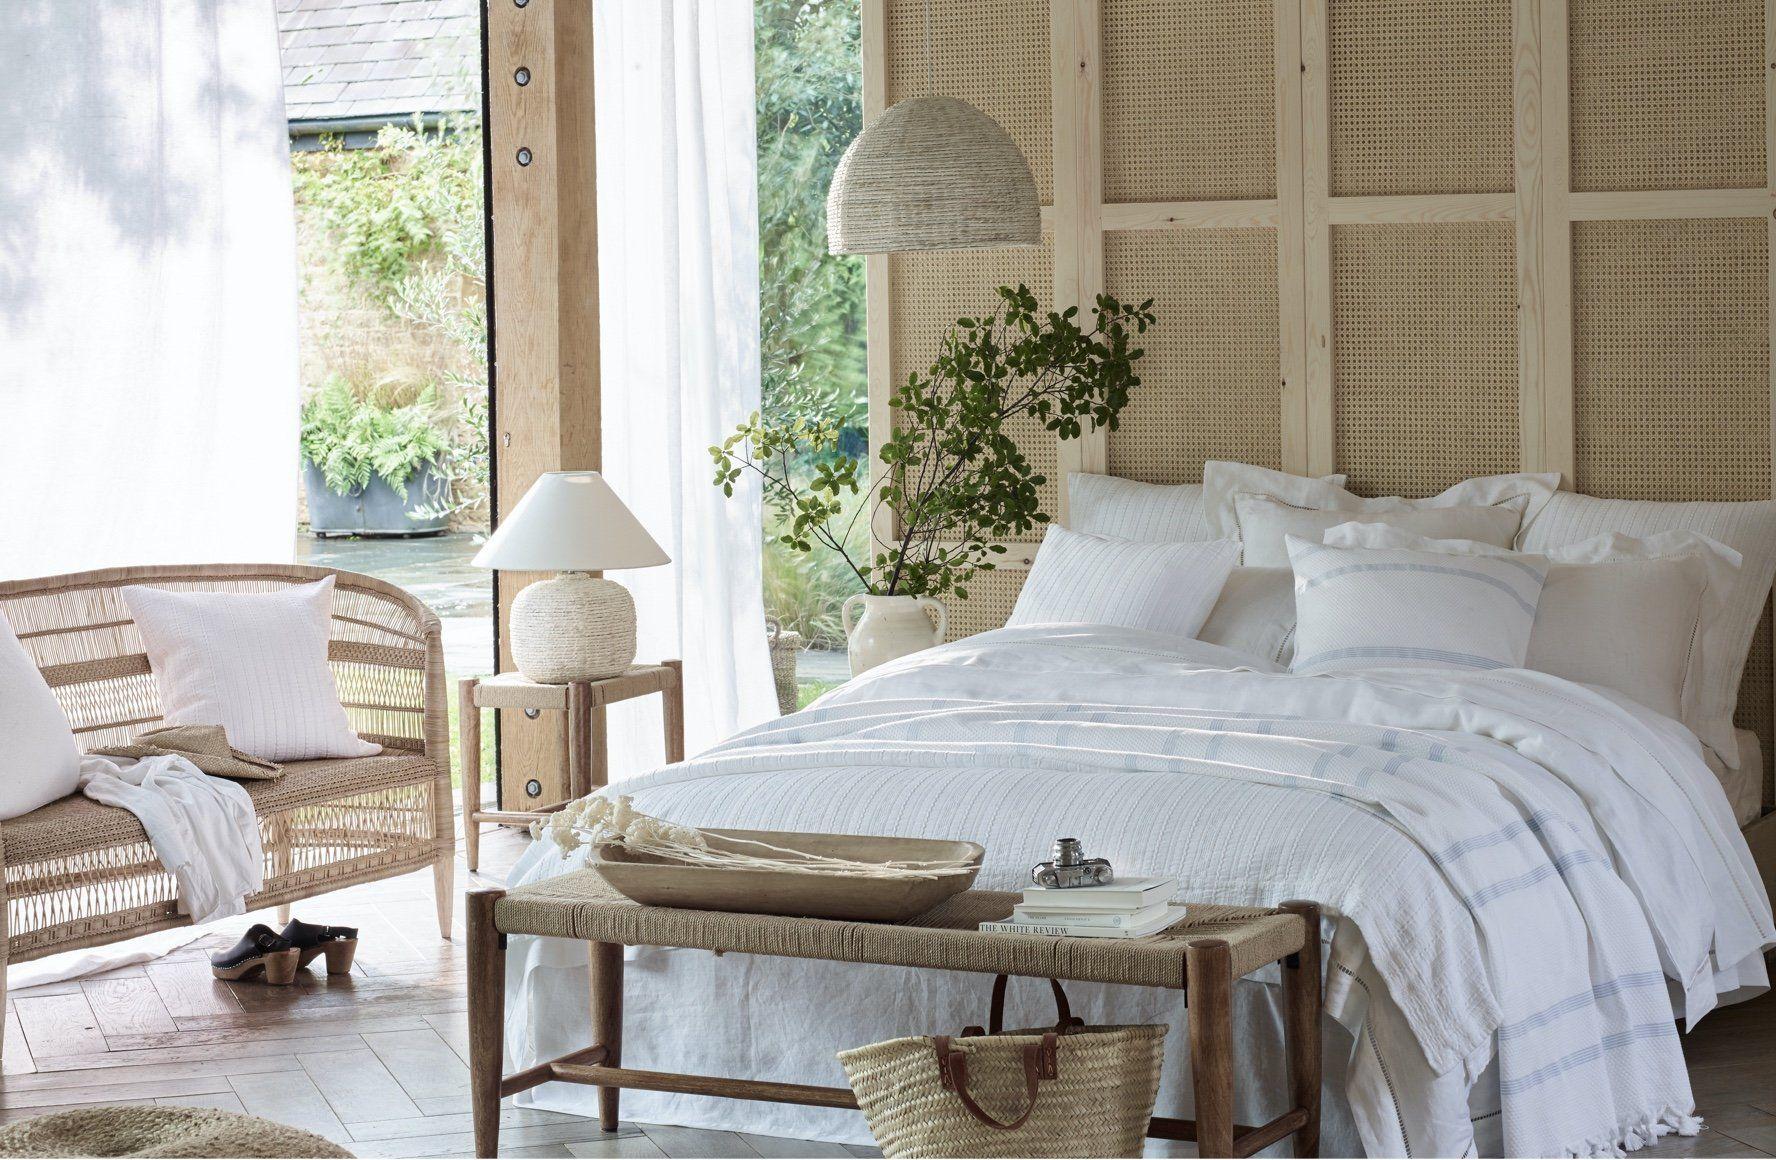 santorini bed linen